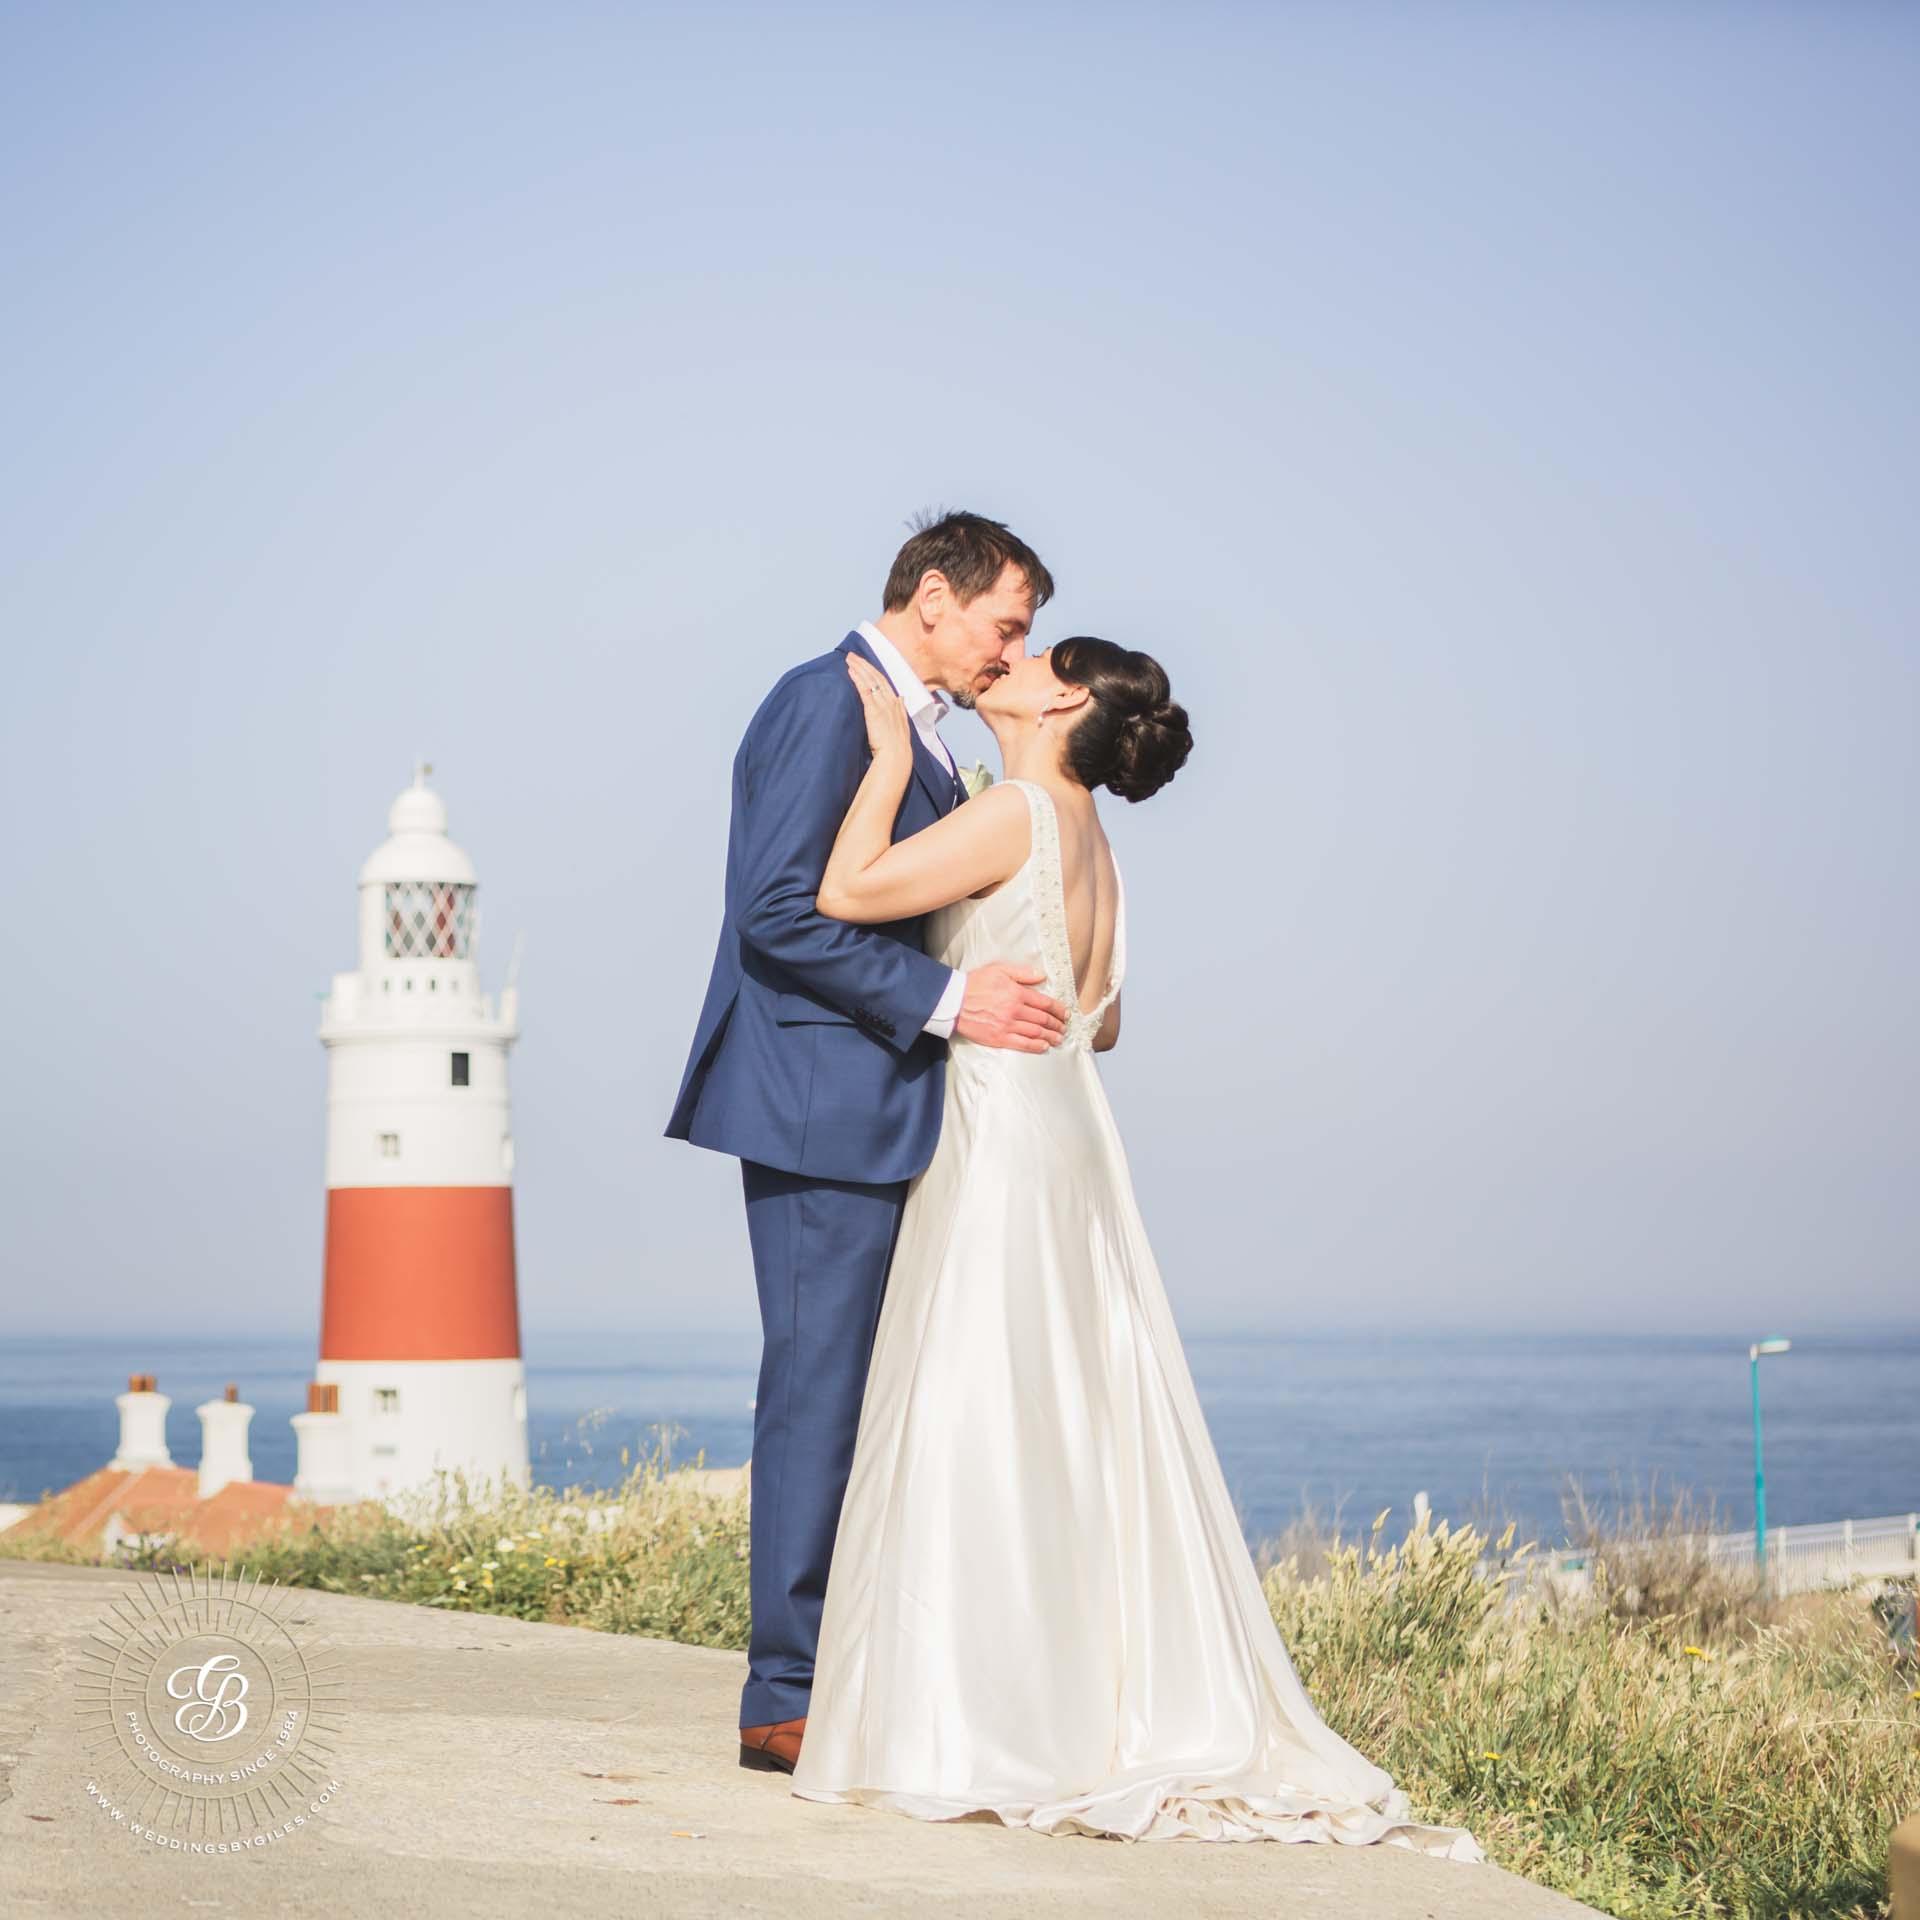 wedding kiss at the light house